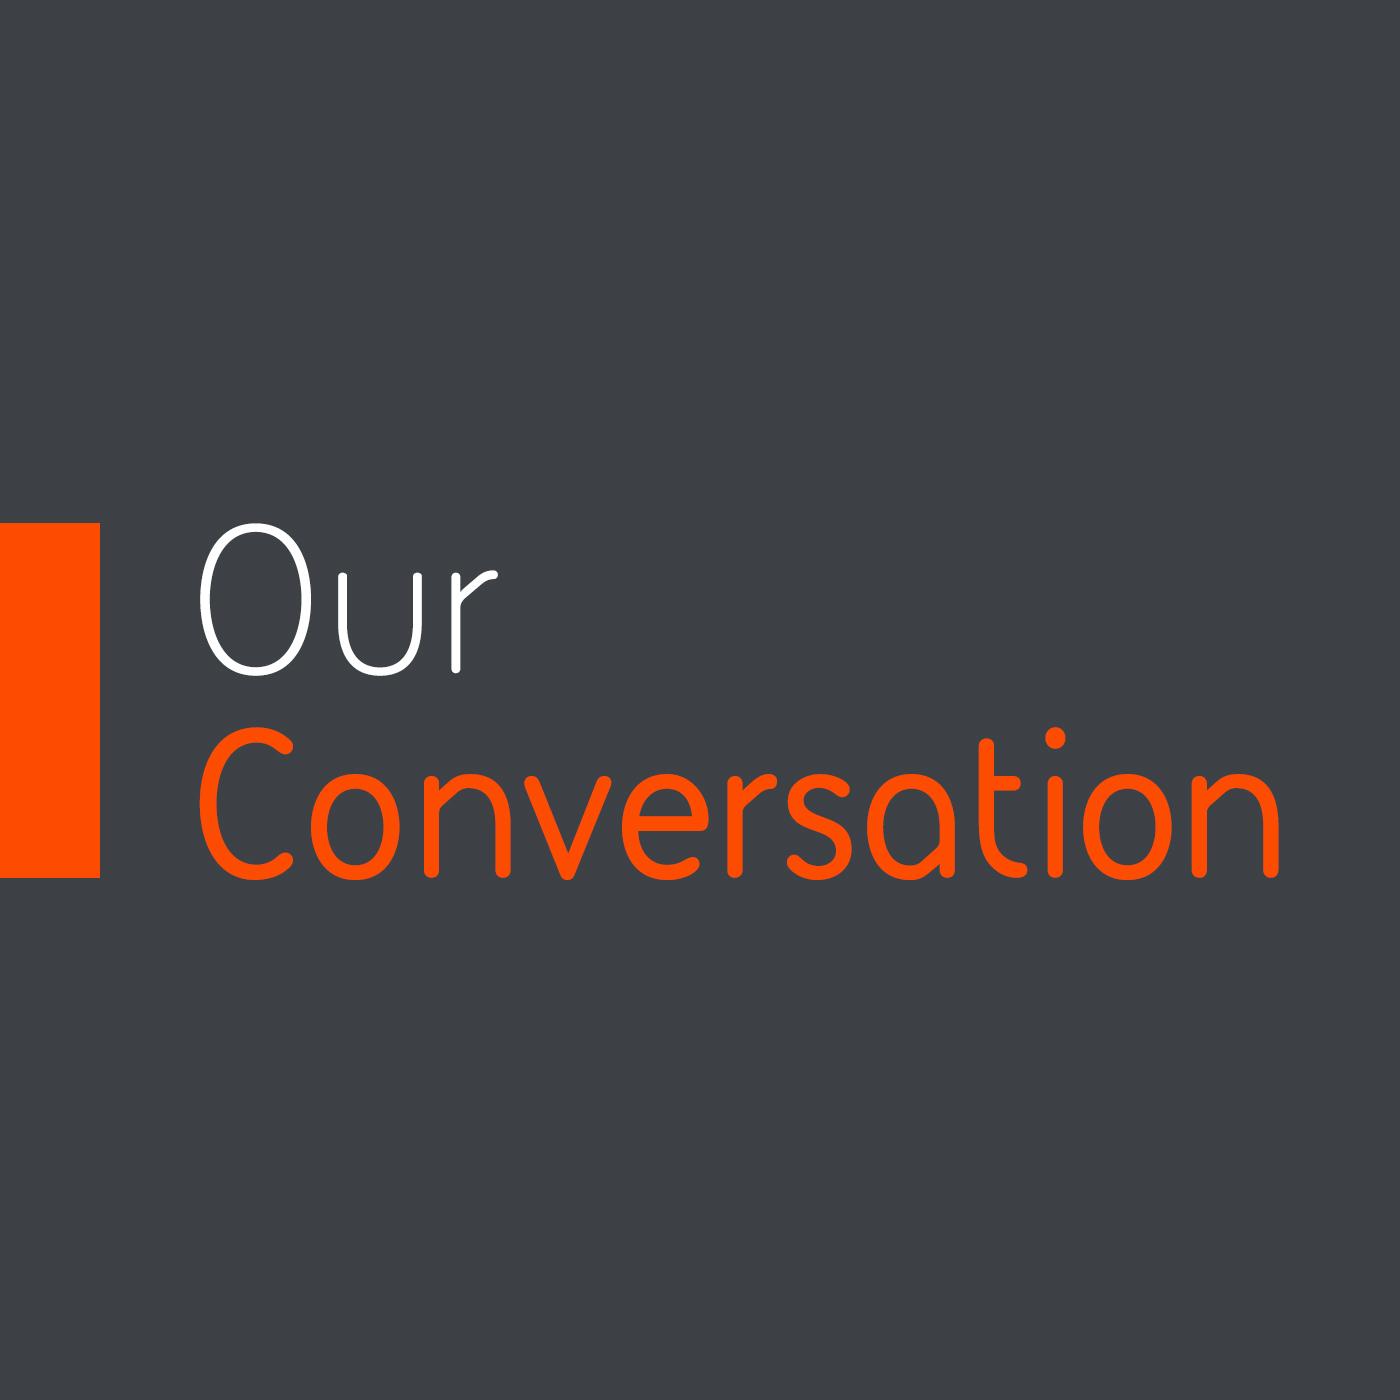 Our Conversation Specials